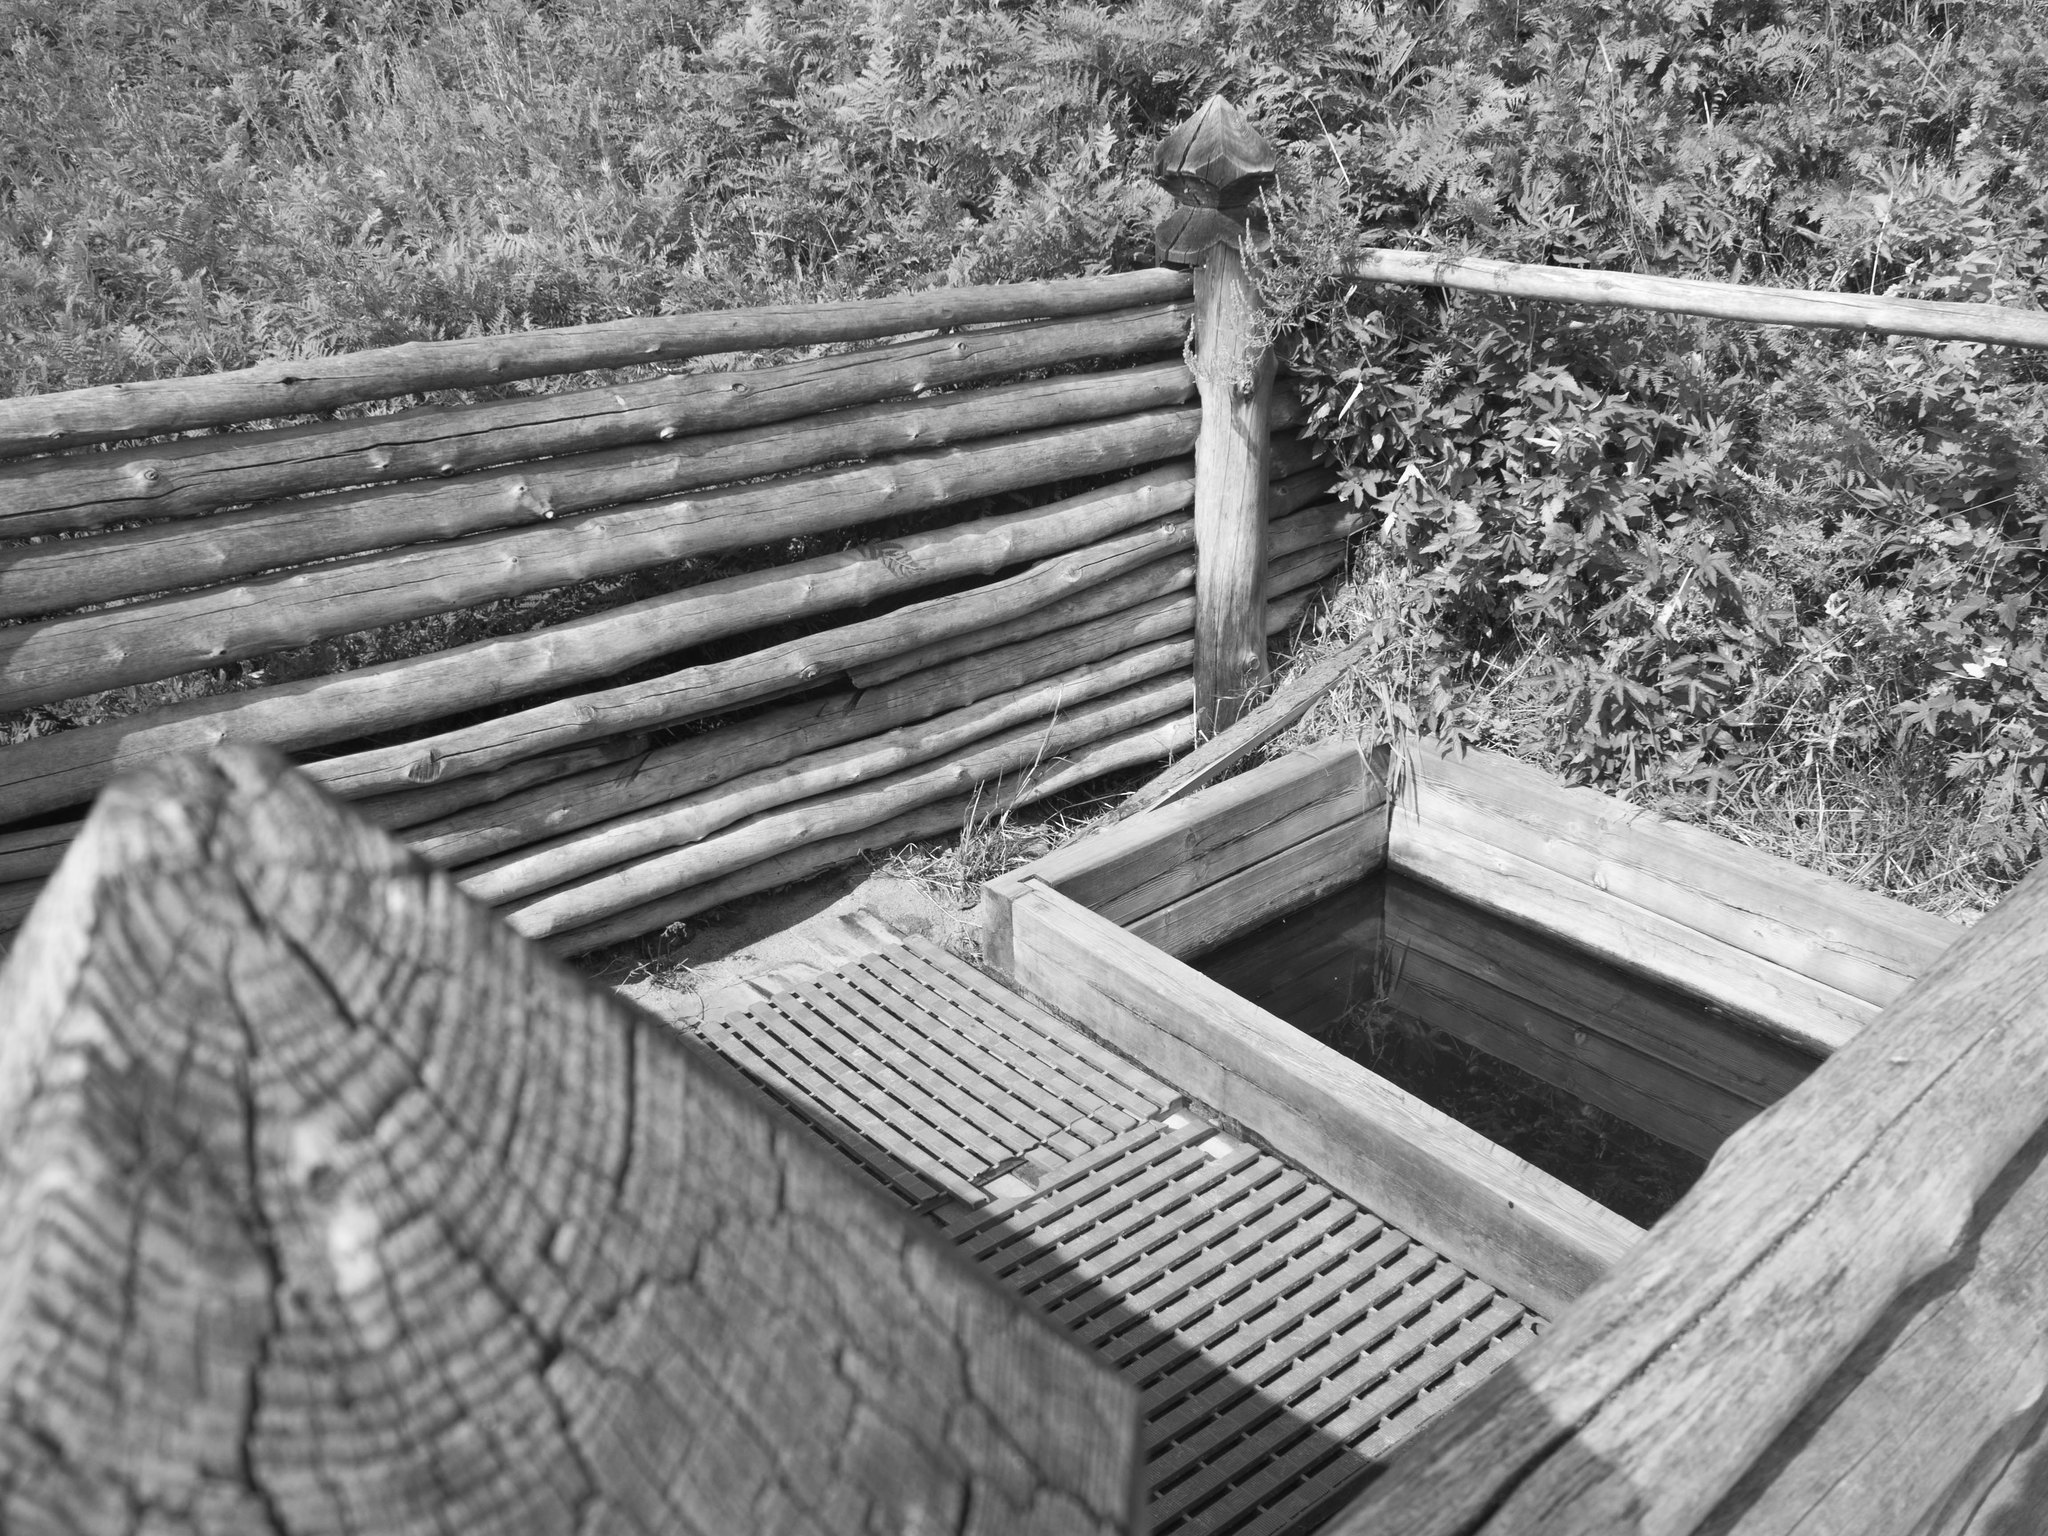 Horká lázeň // Hot spring